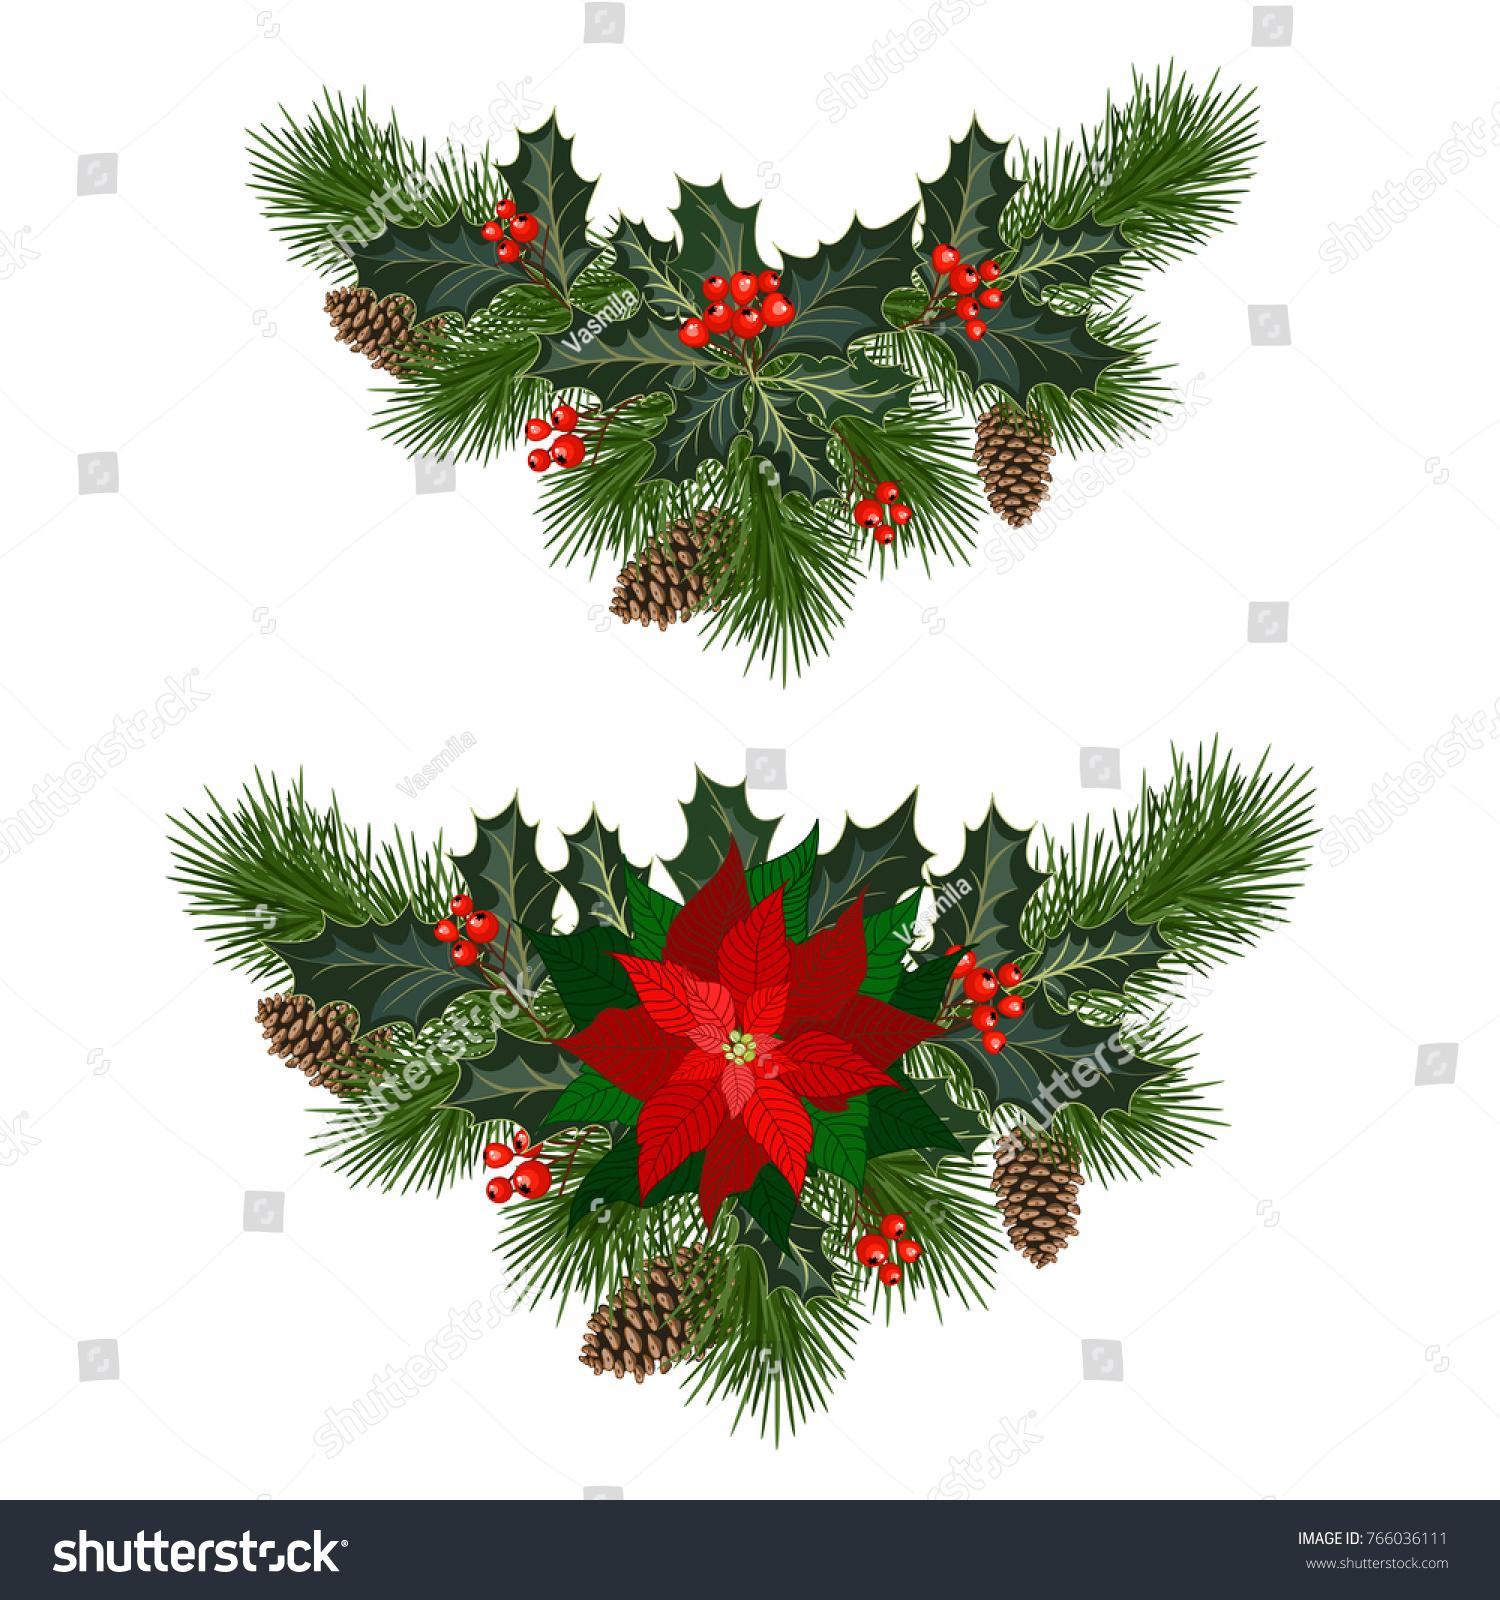 Christmas Decorations Poinsettia Fir Tree Pine Stock Vector